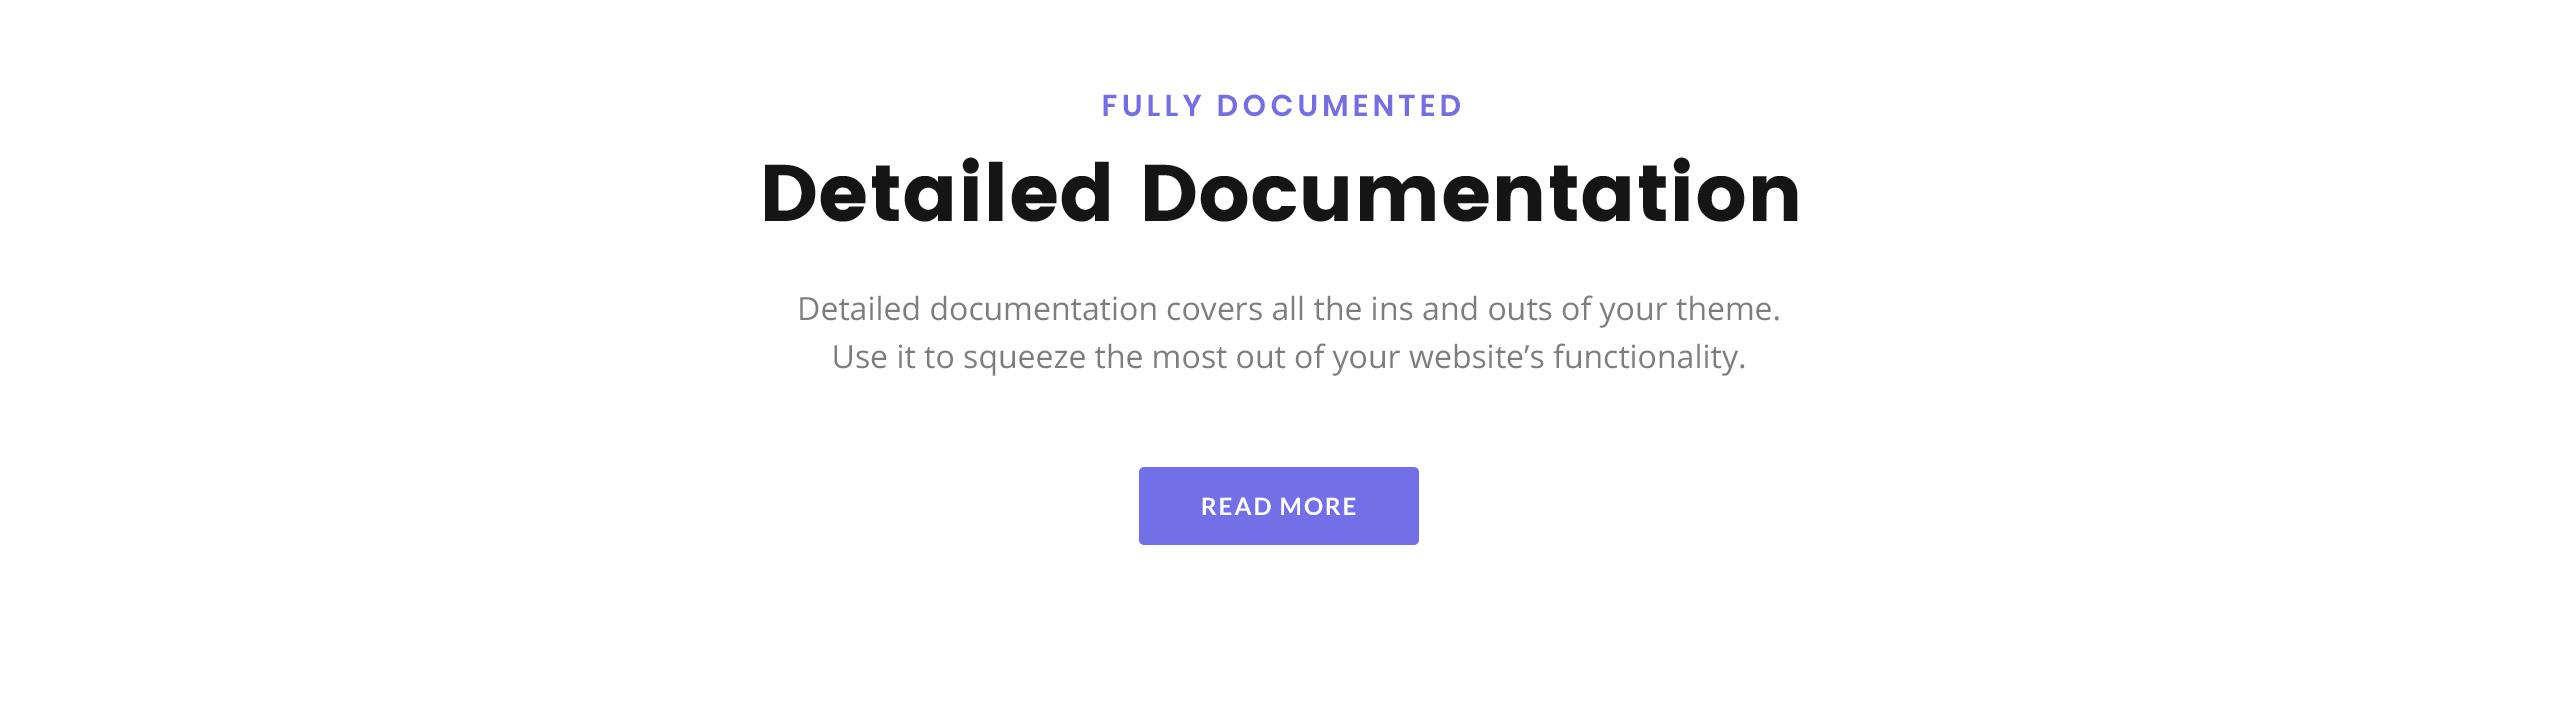 DreamSoft Website Template